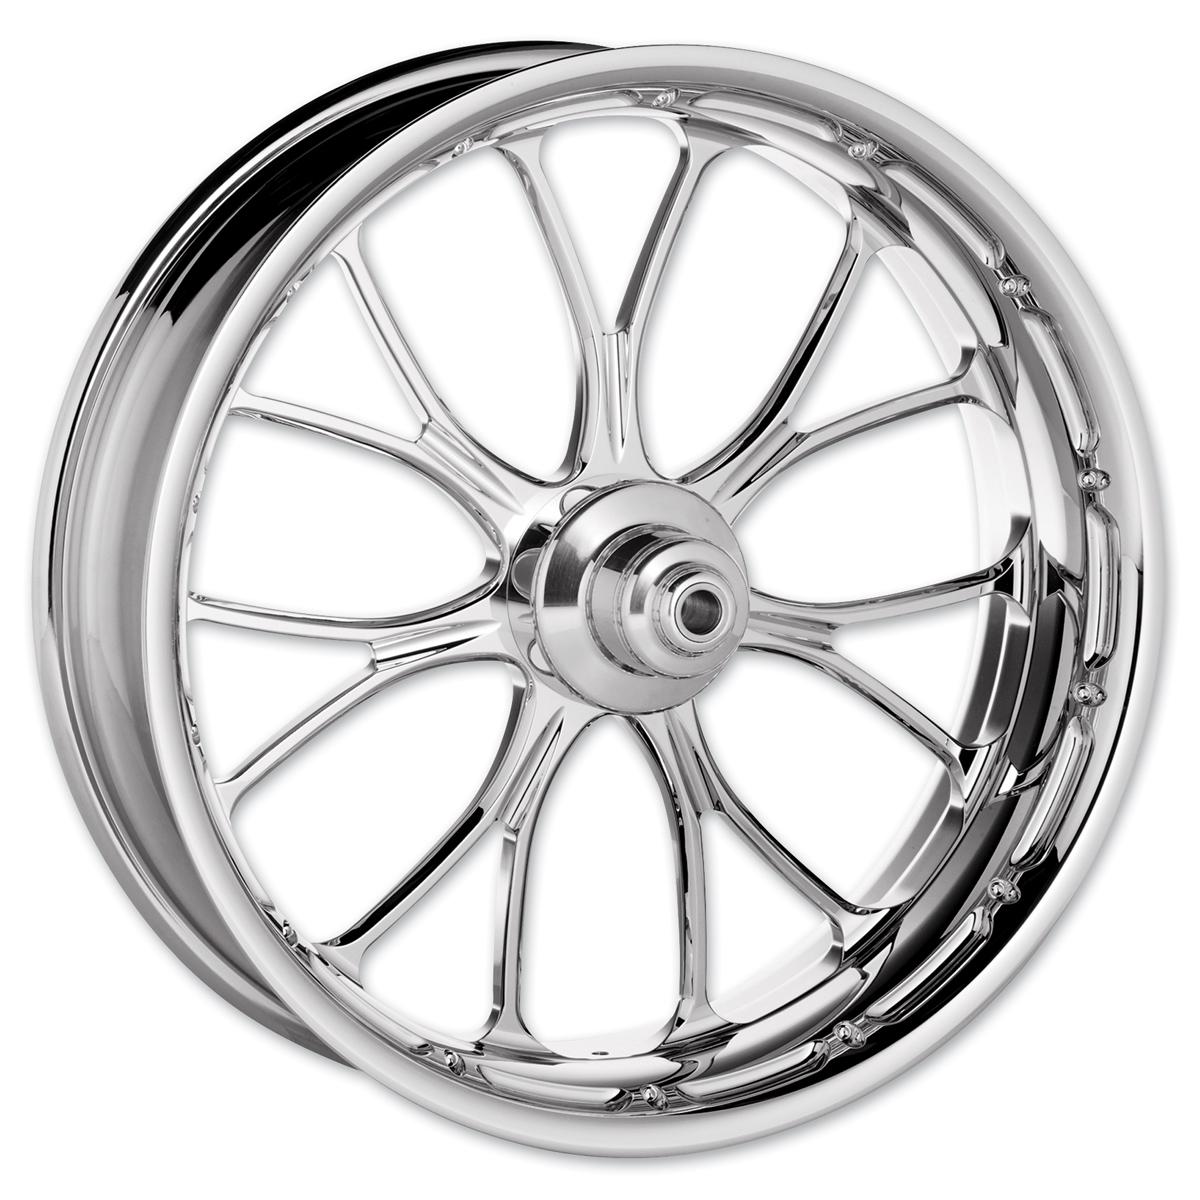 Performance Machine Heathen Chrome Front Wheel 18x3.5 Dual disc